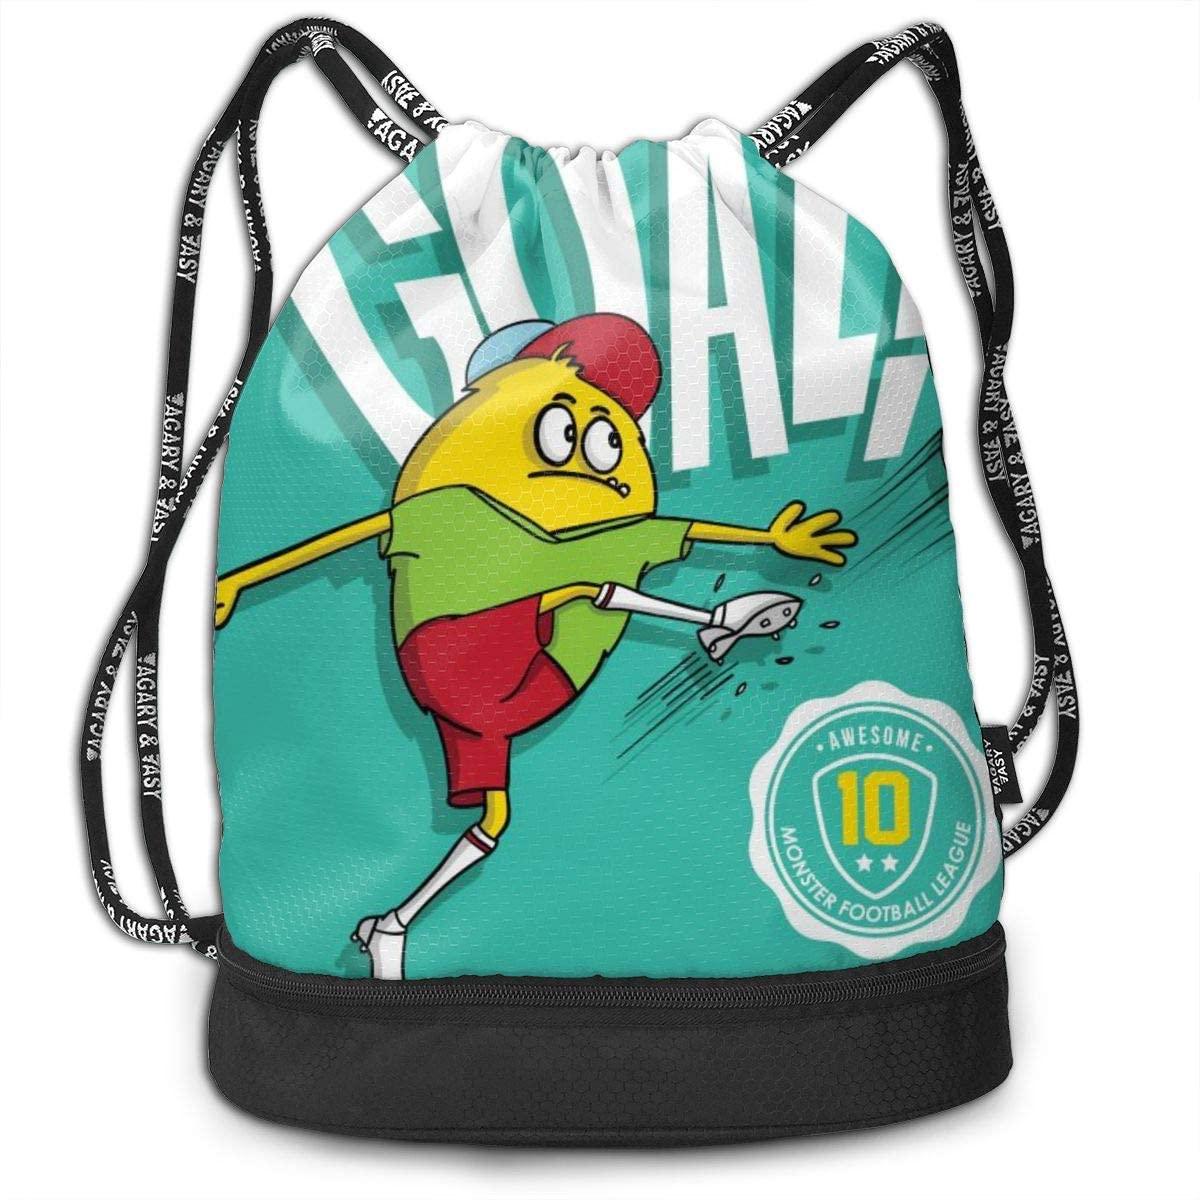 Bundle Backpacks Monster Playing Football Gym Sack Drawstring Bags Casual Daypack Yoga Bag School Training Pouch